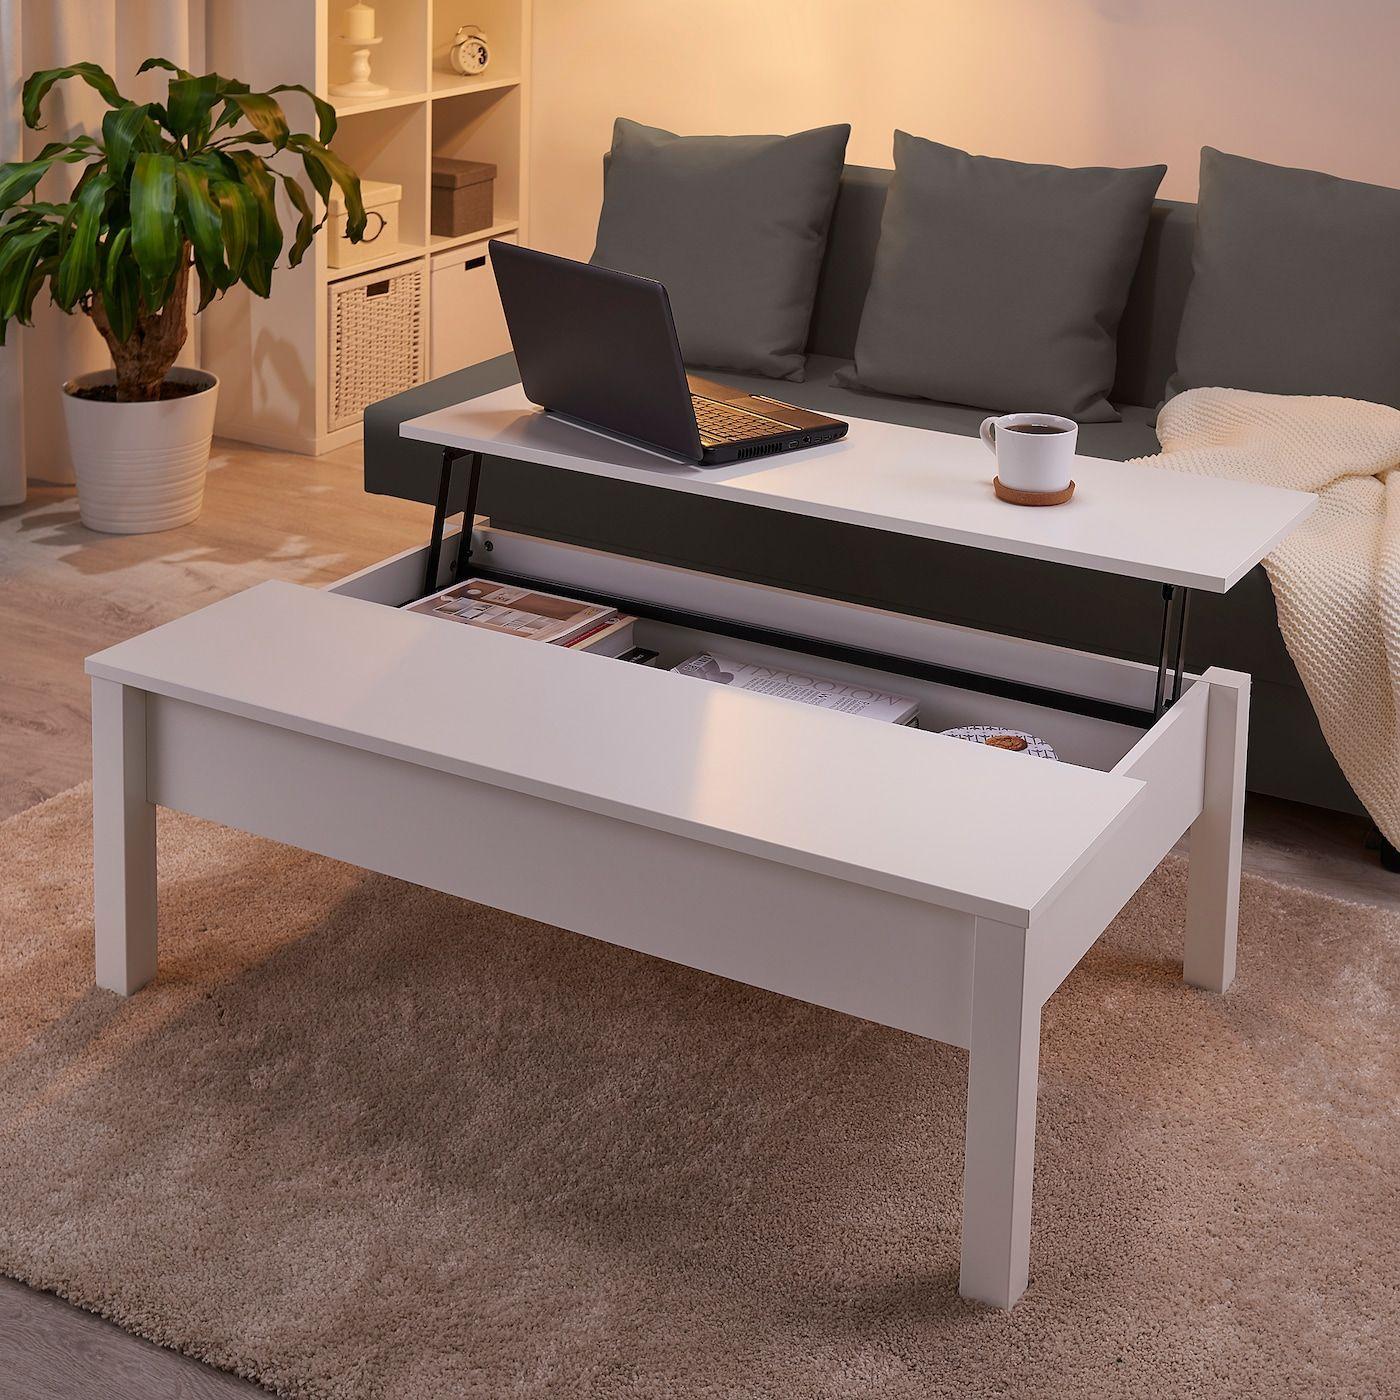 Ikea Trulstorp Coffee Table White Table Basse Blanc Table De Salon Table D Appoint Ikea [ 1400 x 1400 Pixel ]